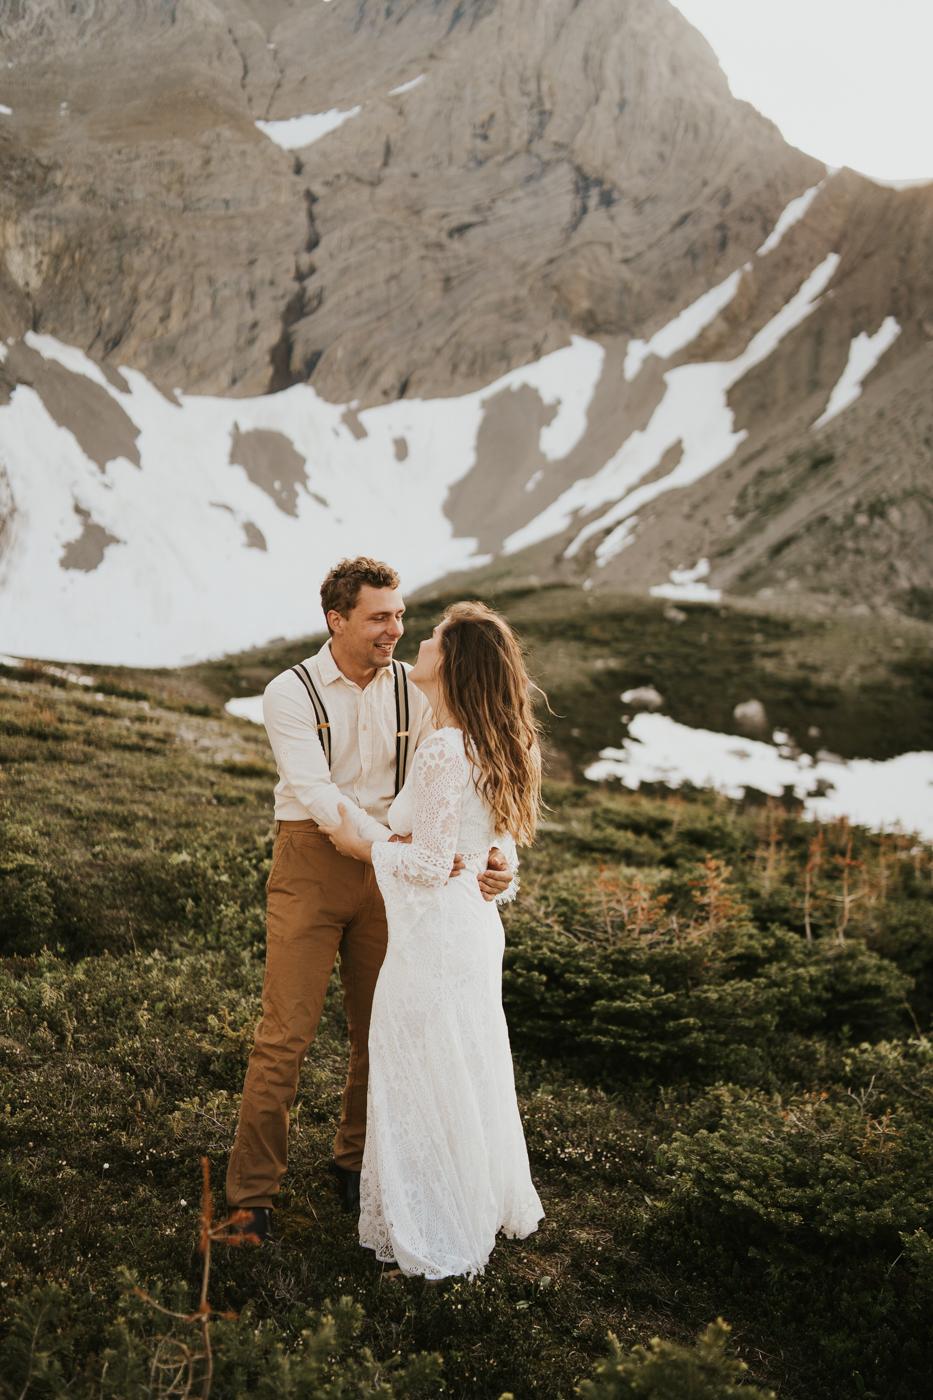 tyraephotography_photographer_wedding_elopement_engagement_photography-08020.jpg